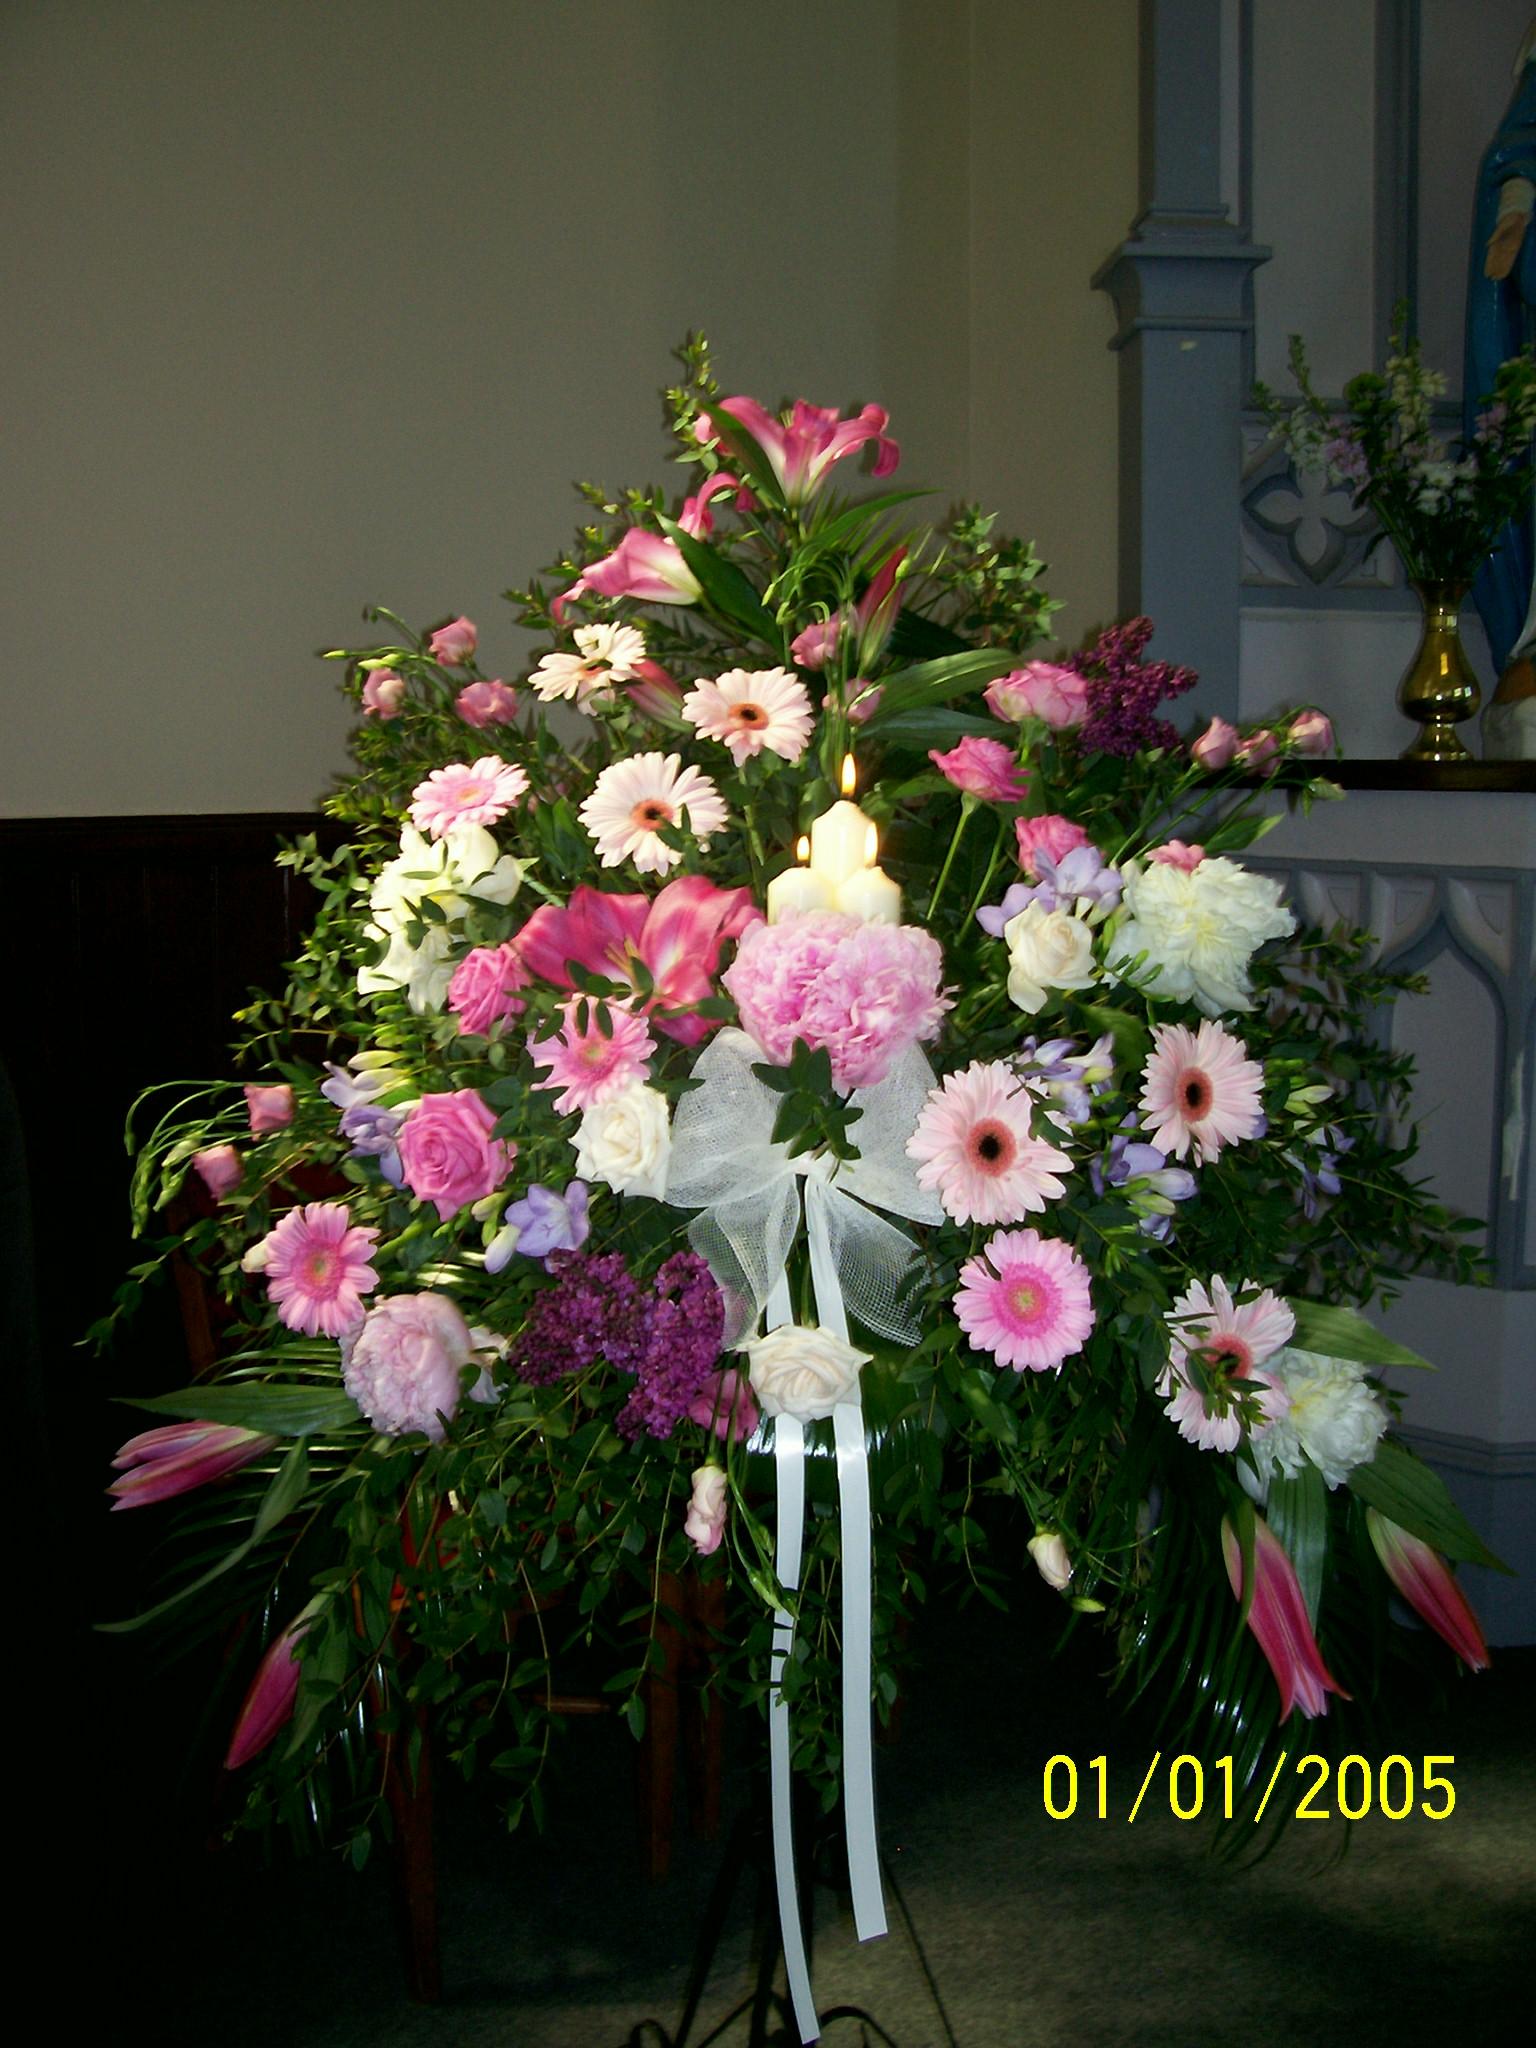 Symetrical arrangement inc. Candles